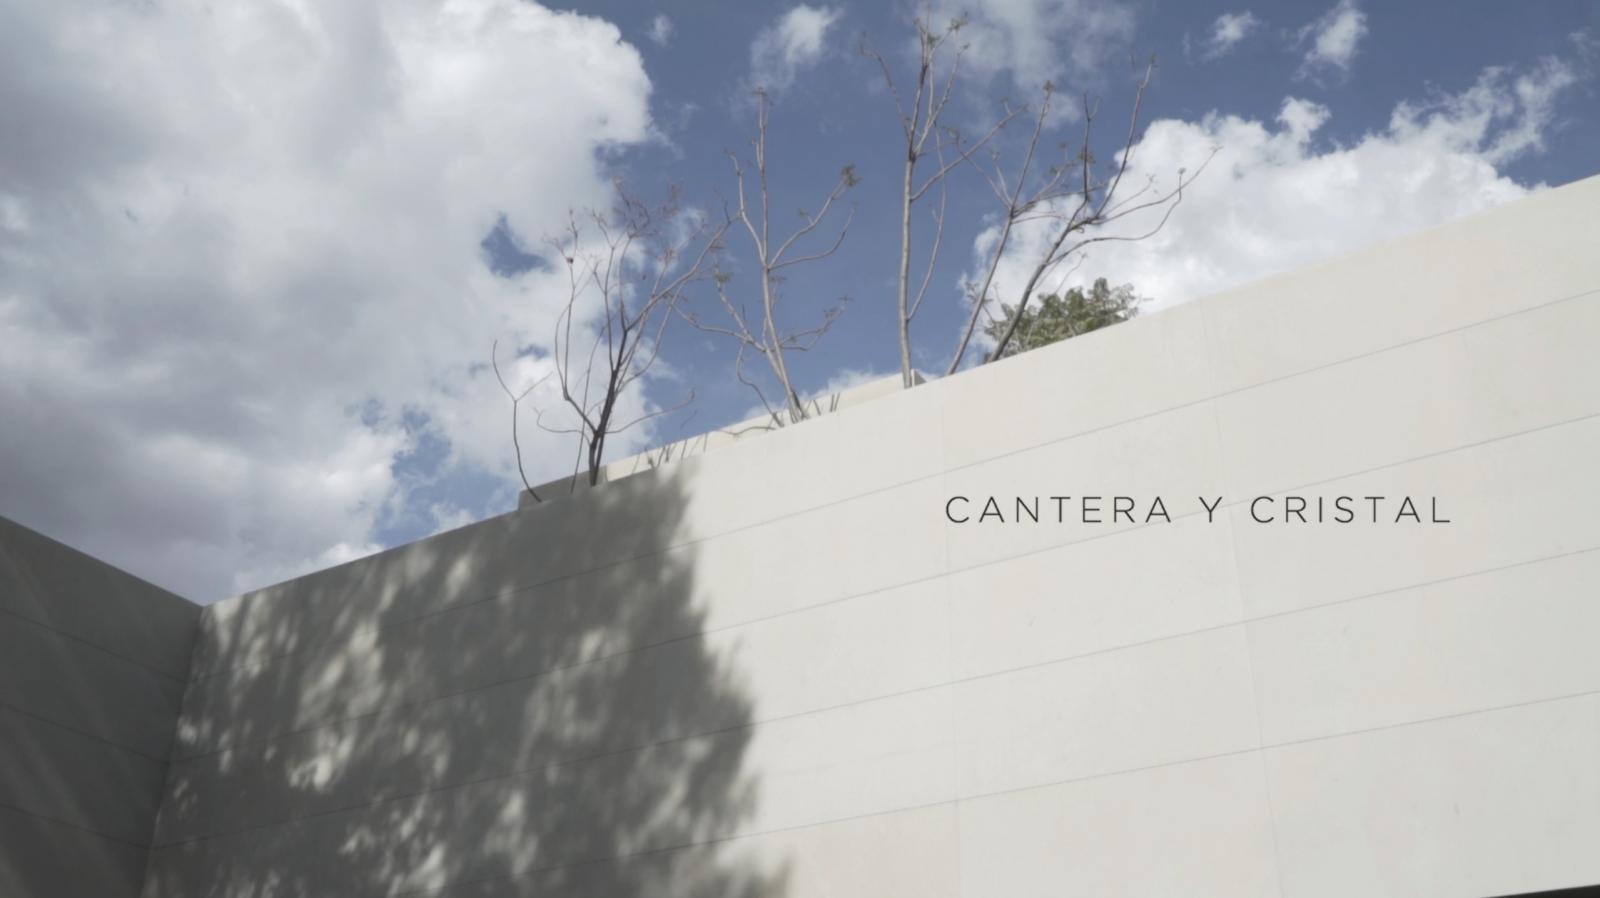 Photography image - Loading Screenshot_cantera_y_cristal_.png